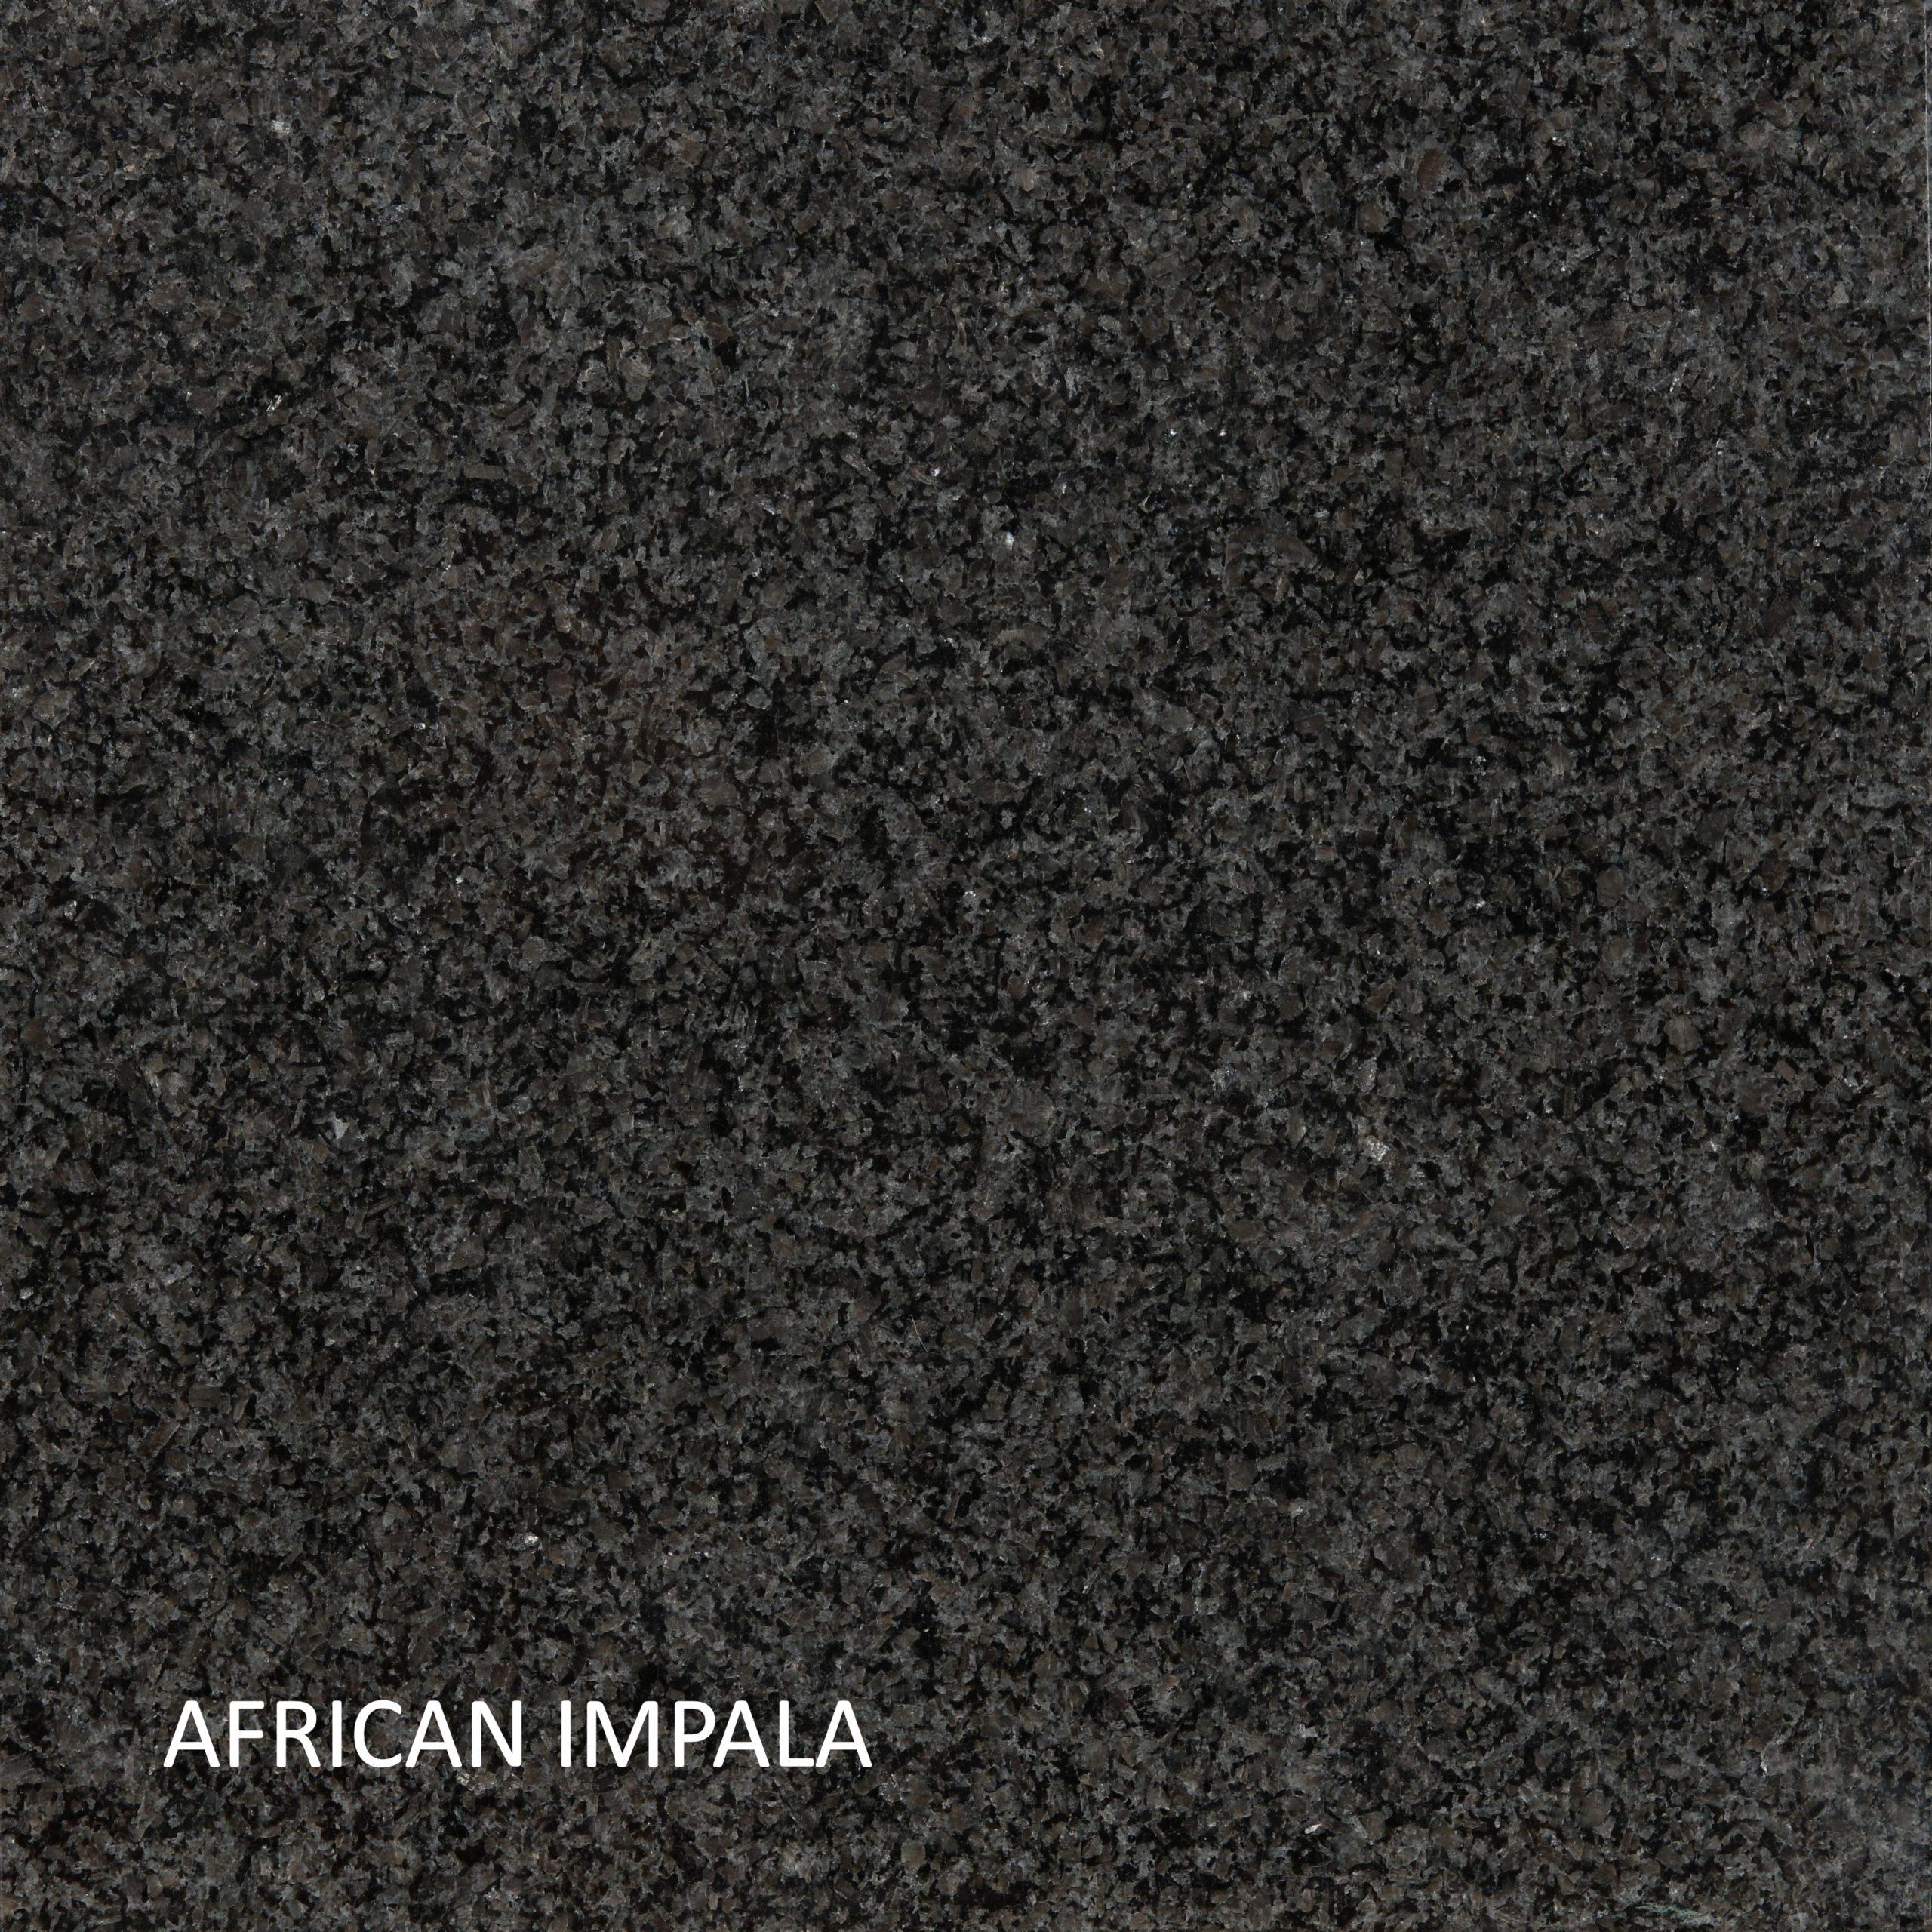 Schwarz-Afrikanisch-Impala